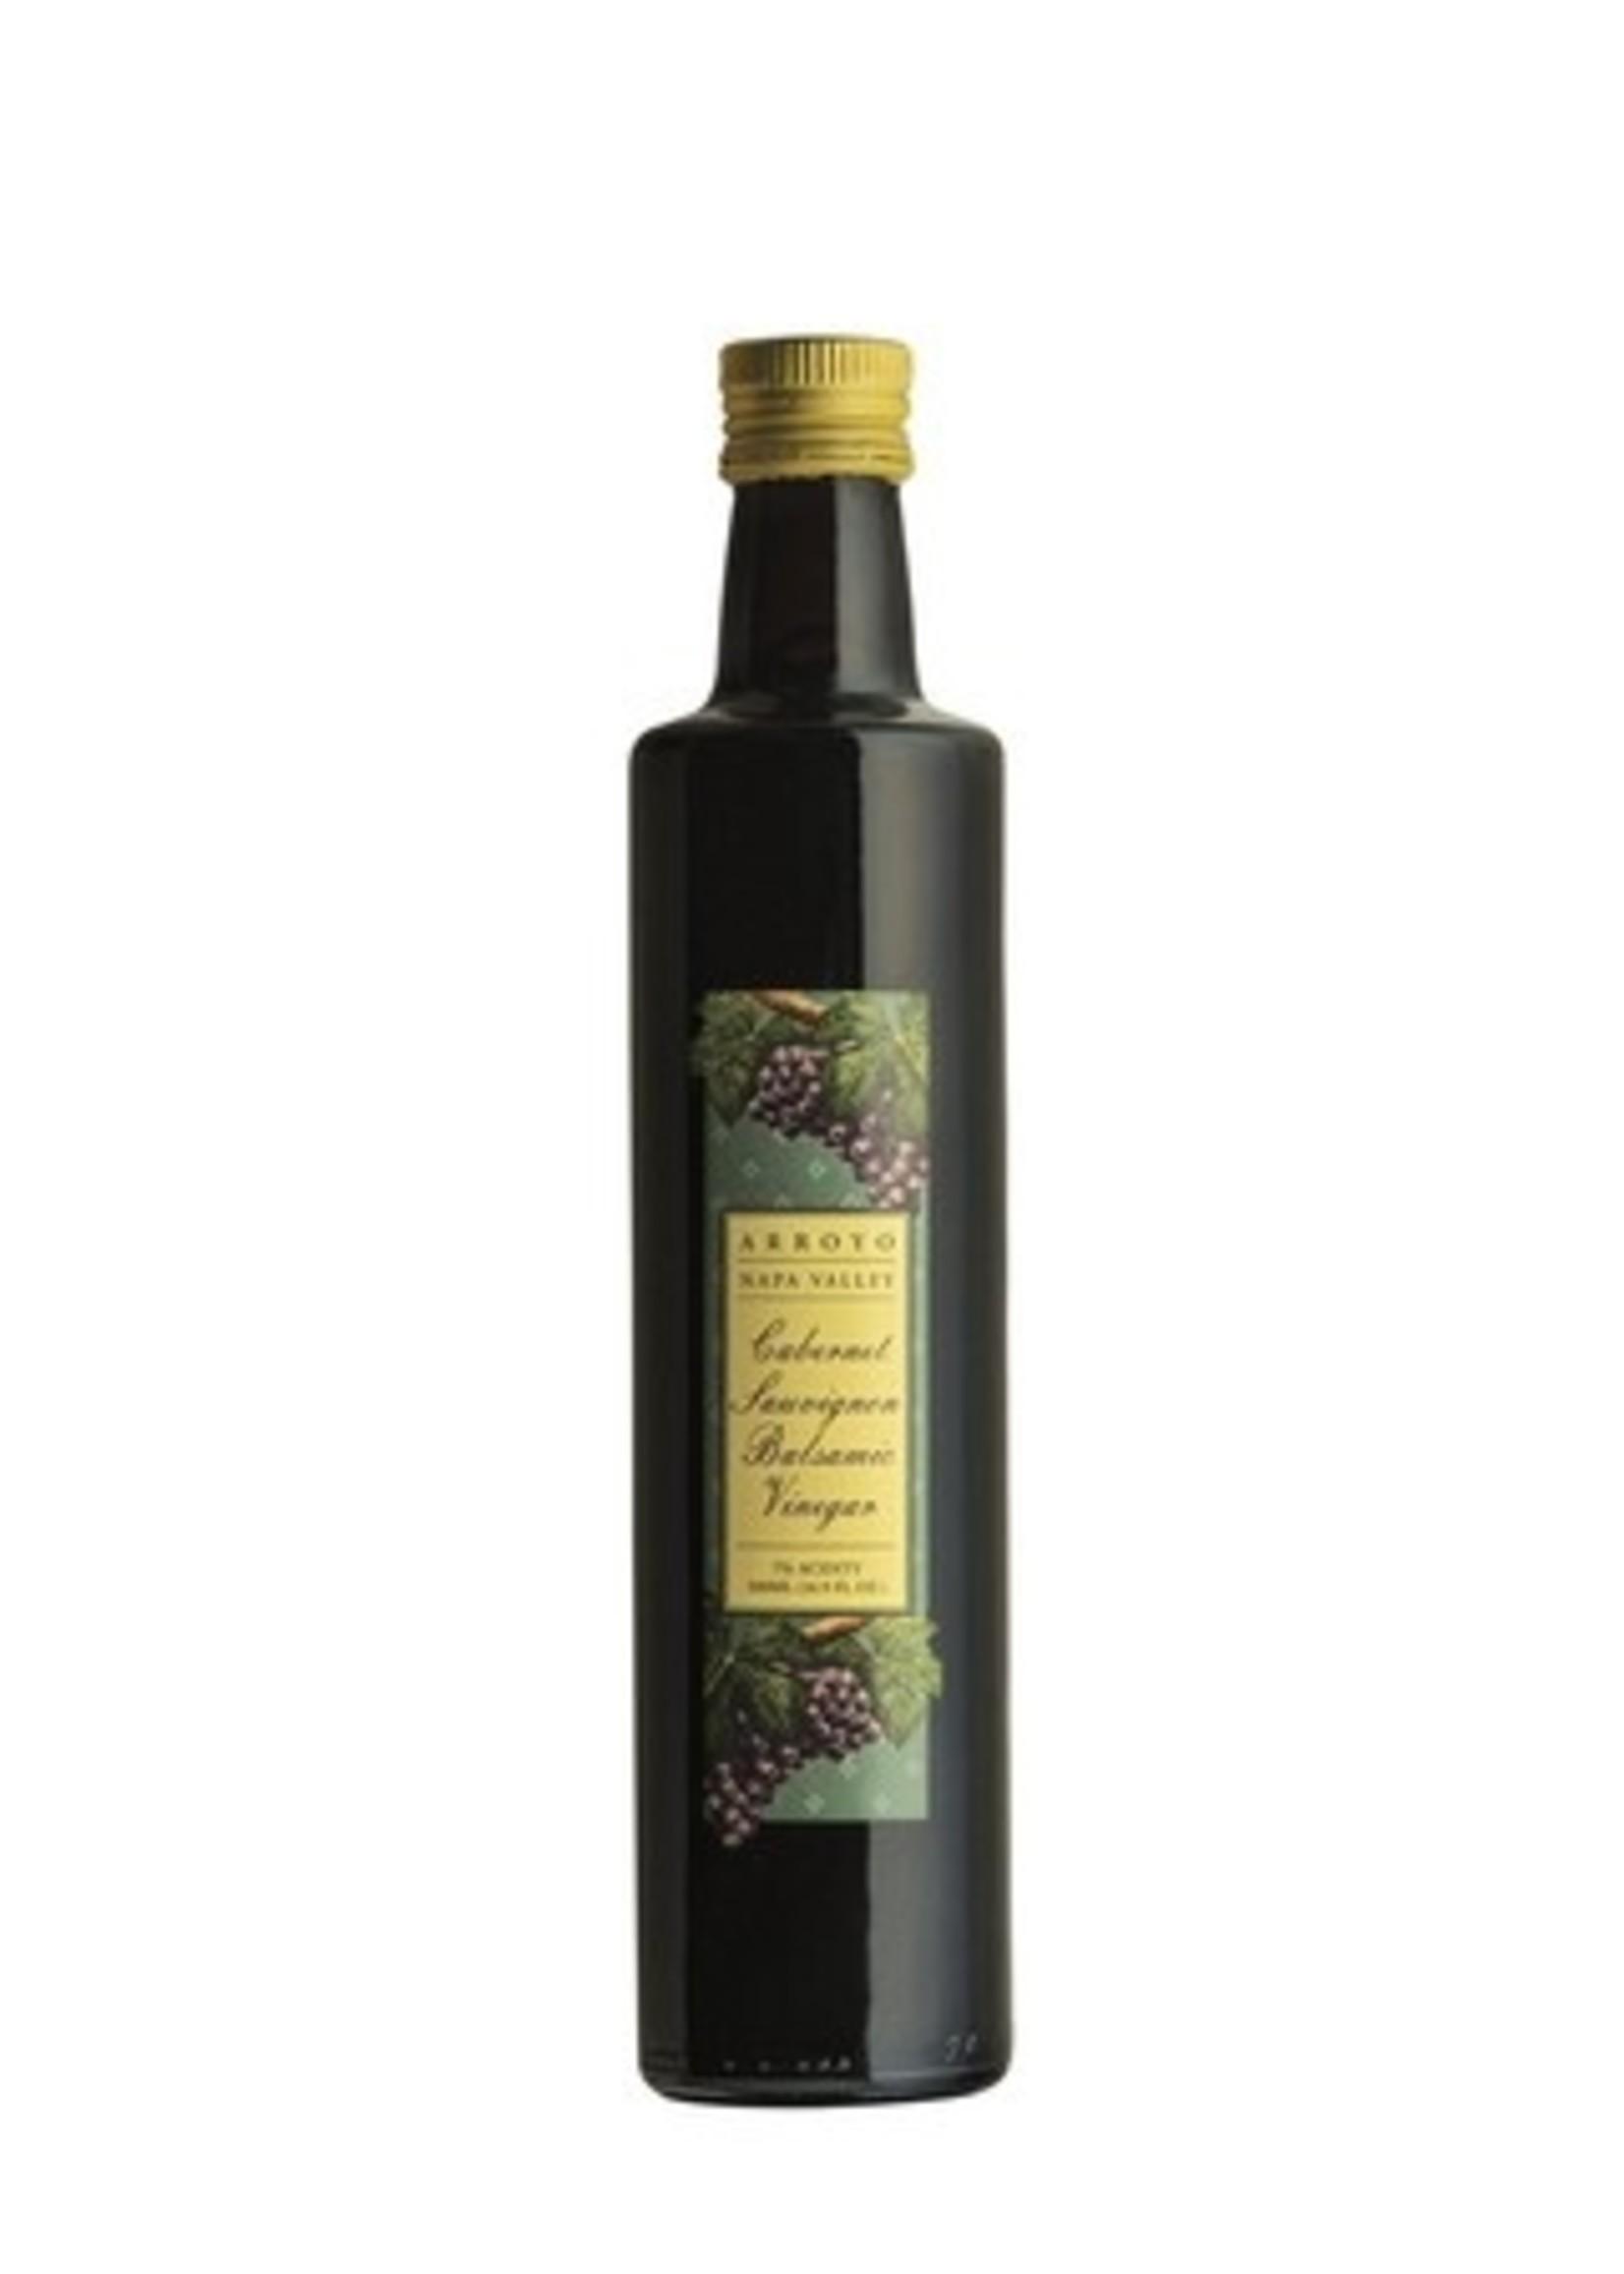 Vincent Arroyo Vinyards Cabernet Sauvignon Balsamic Vinegar